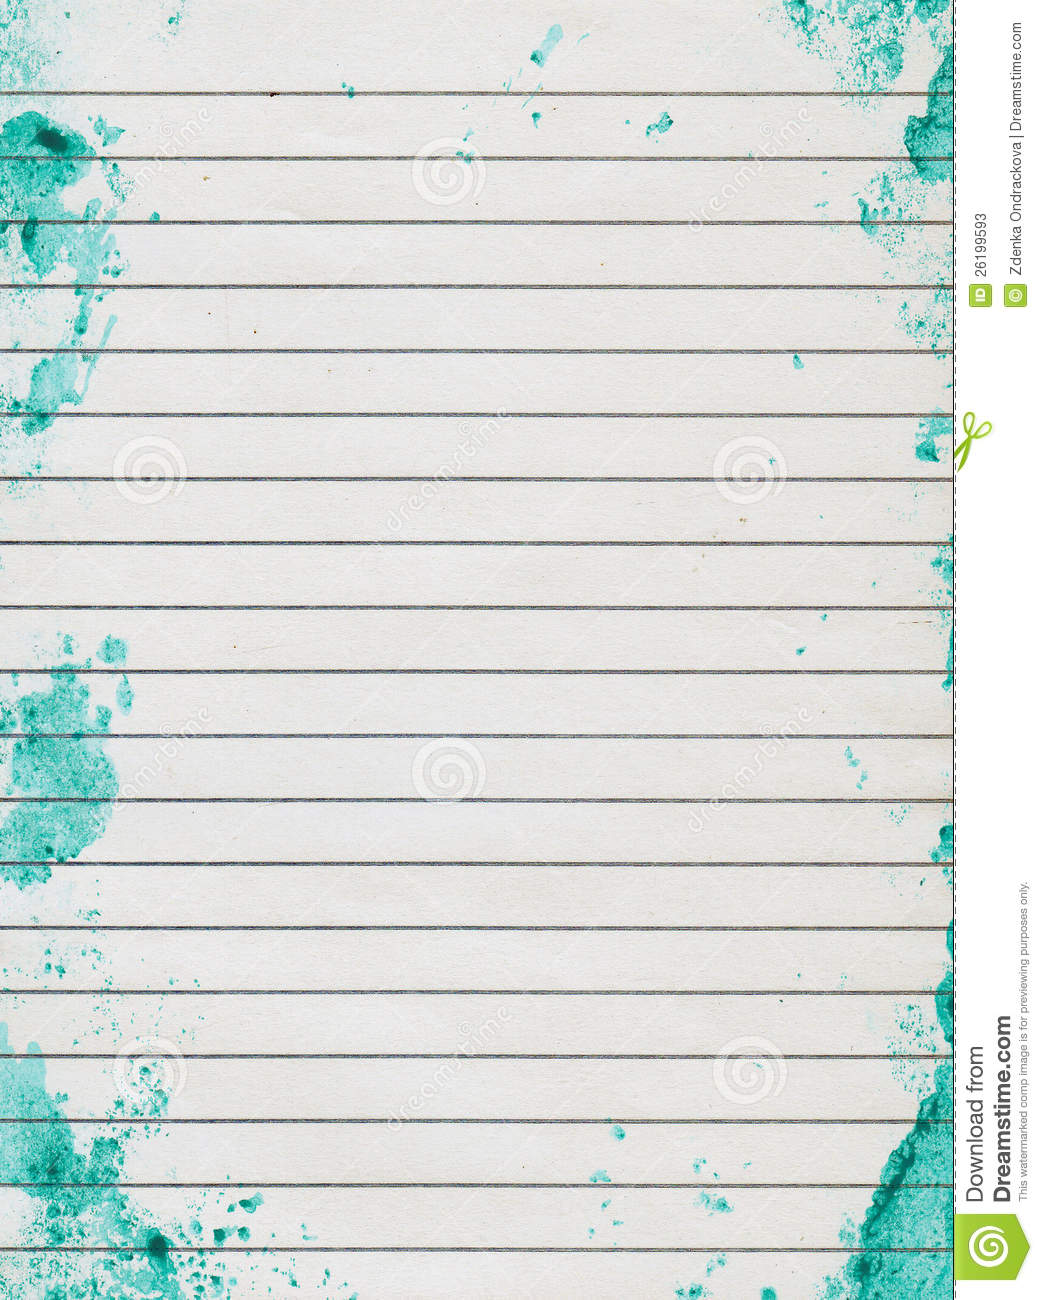 Lined Paper Wallpaper WallpaperSafari – Line Paper Background